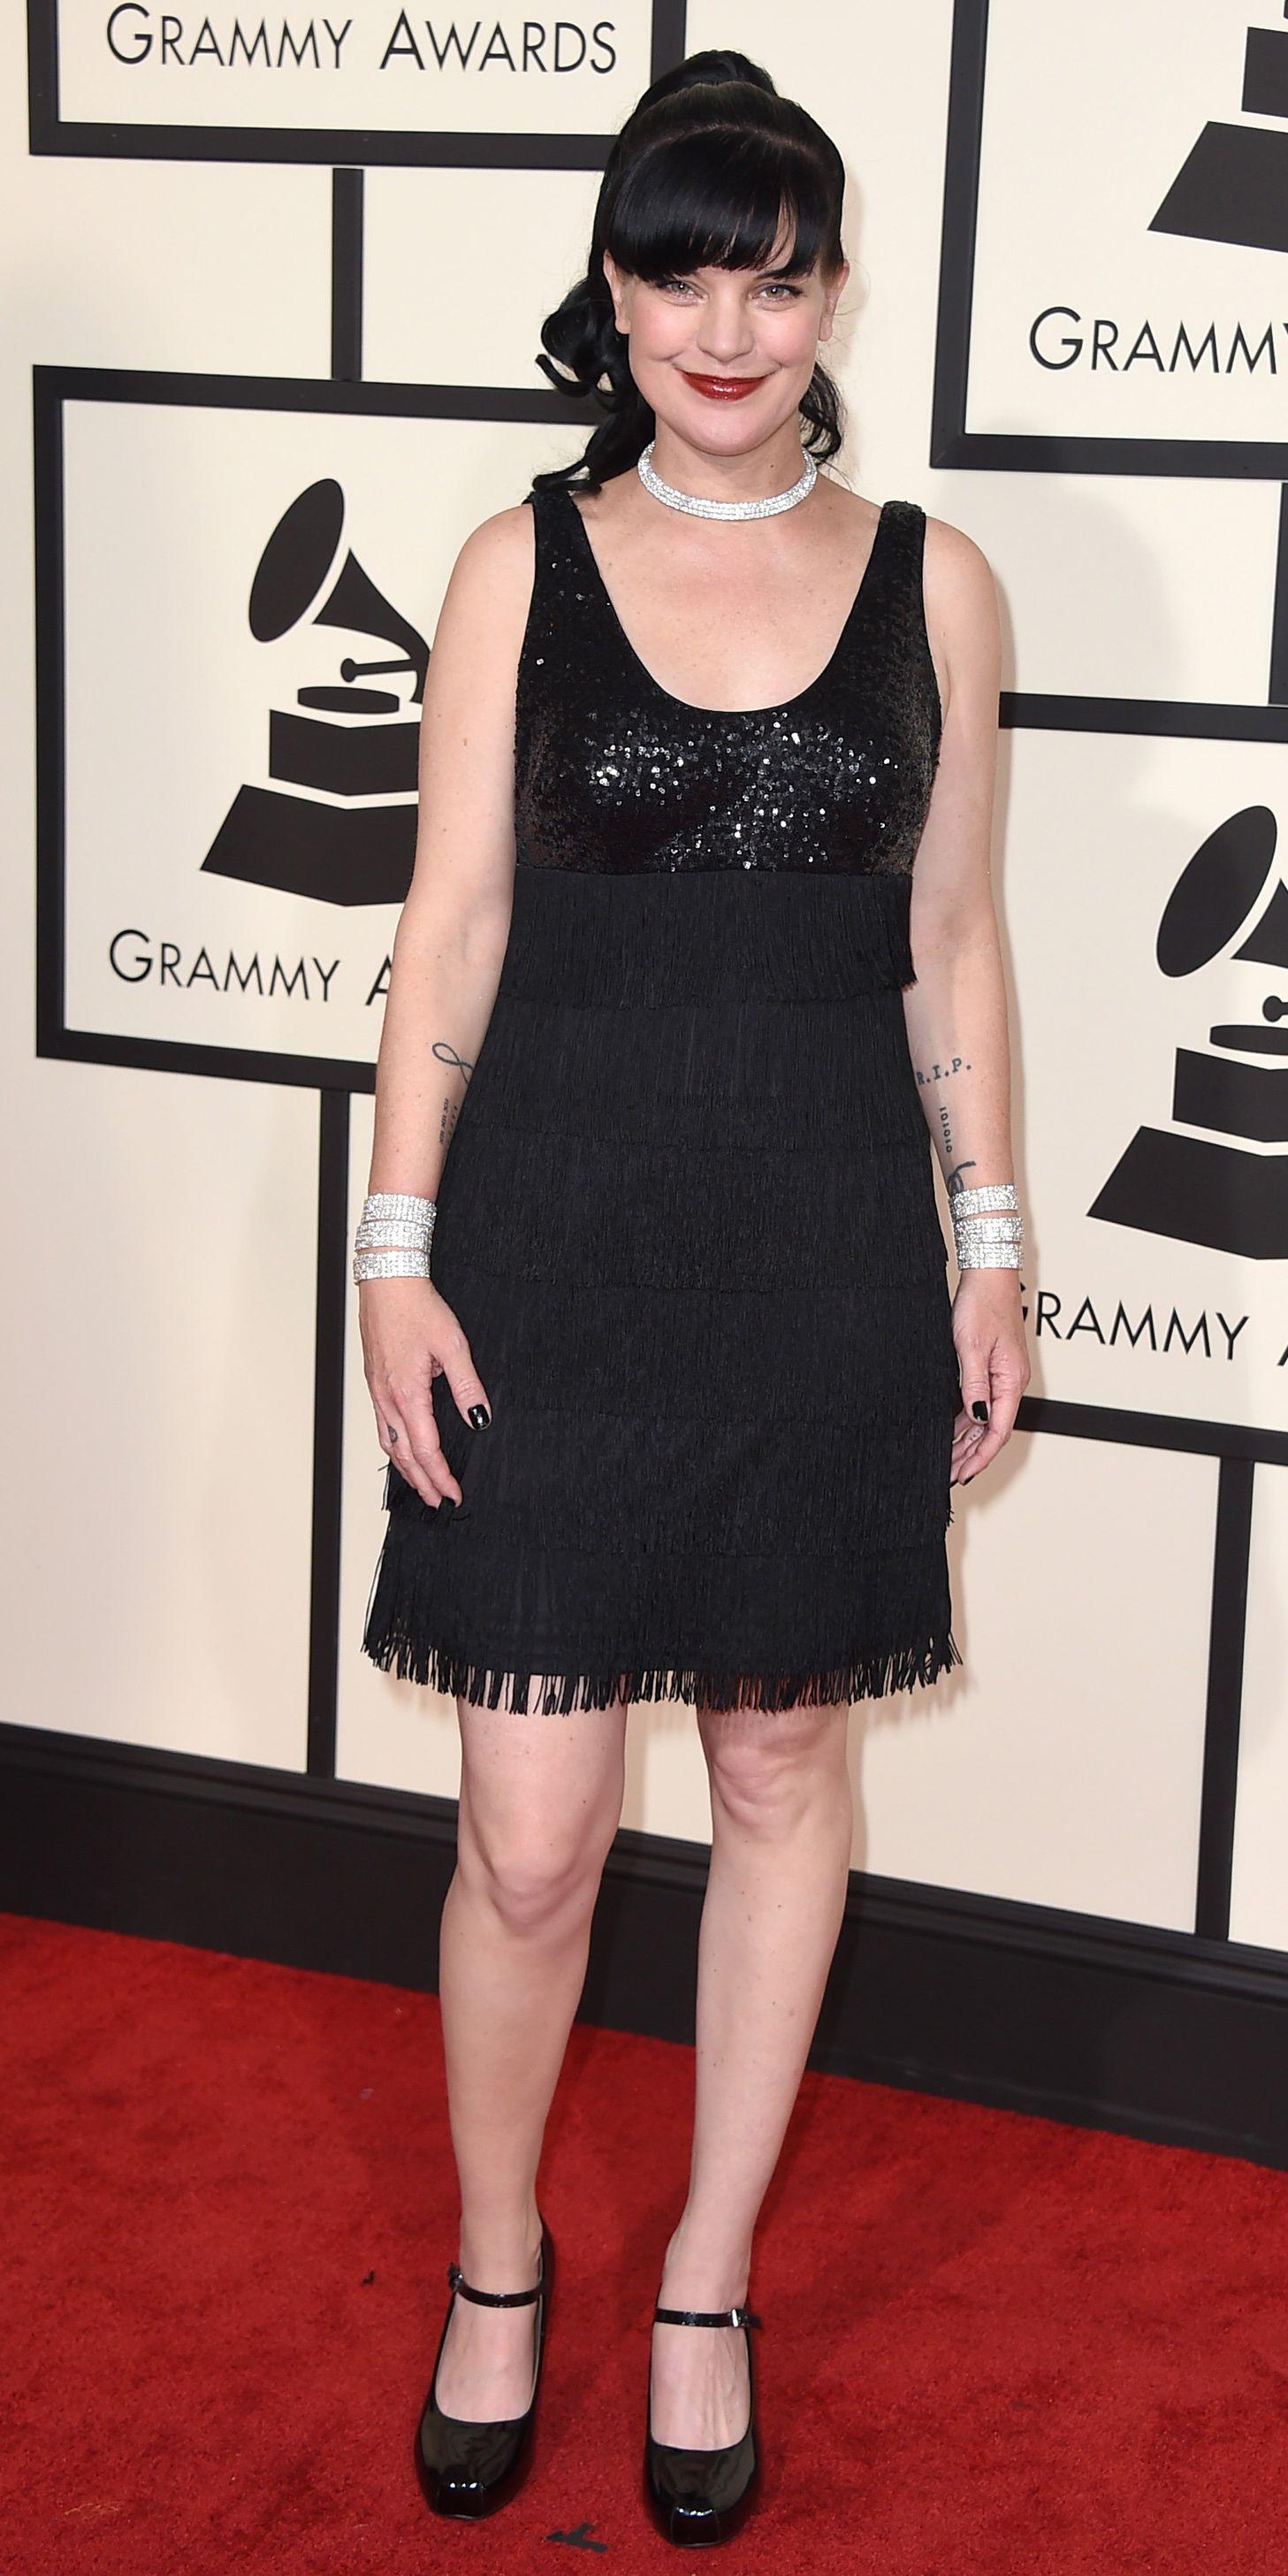 Pauley Perrette in short green dress at Grammy redcarpet